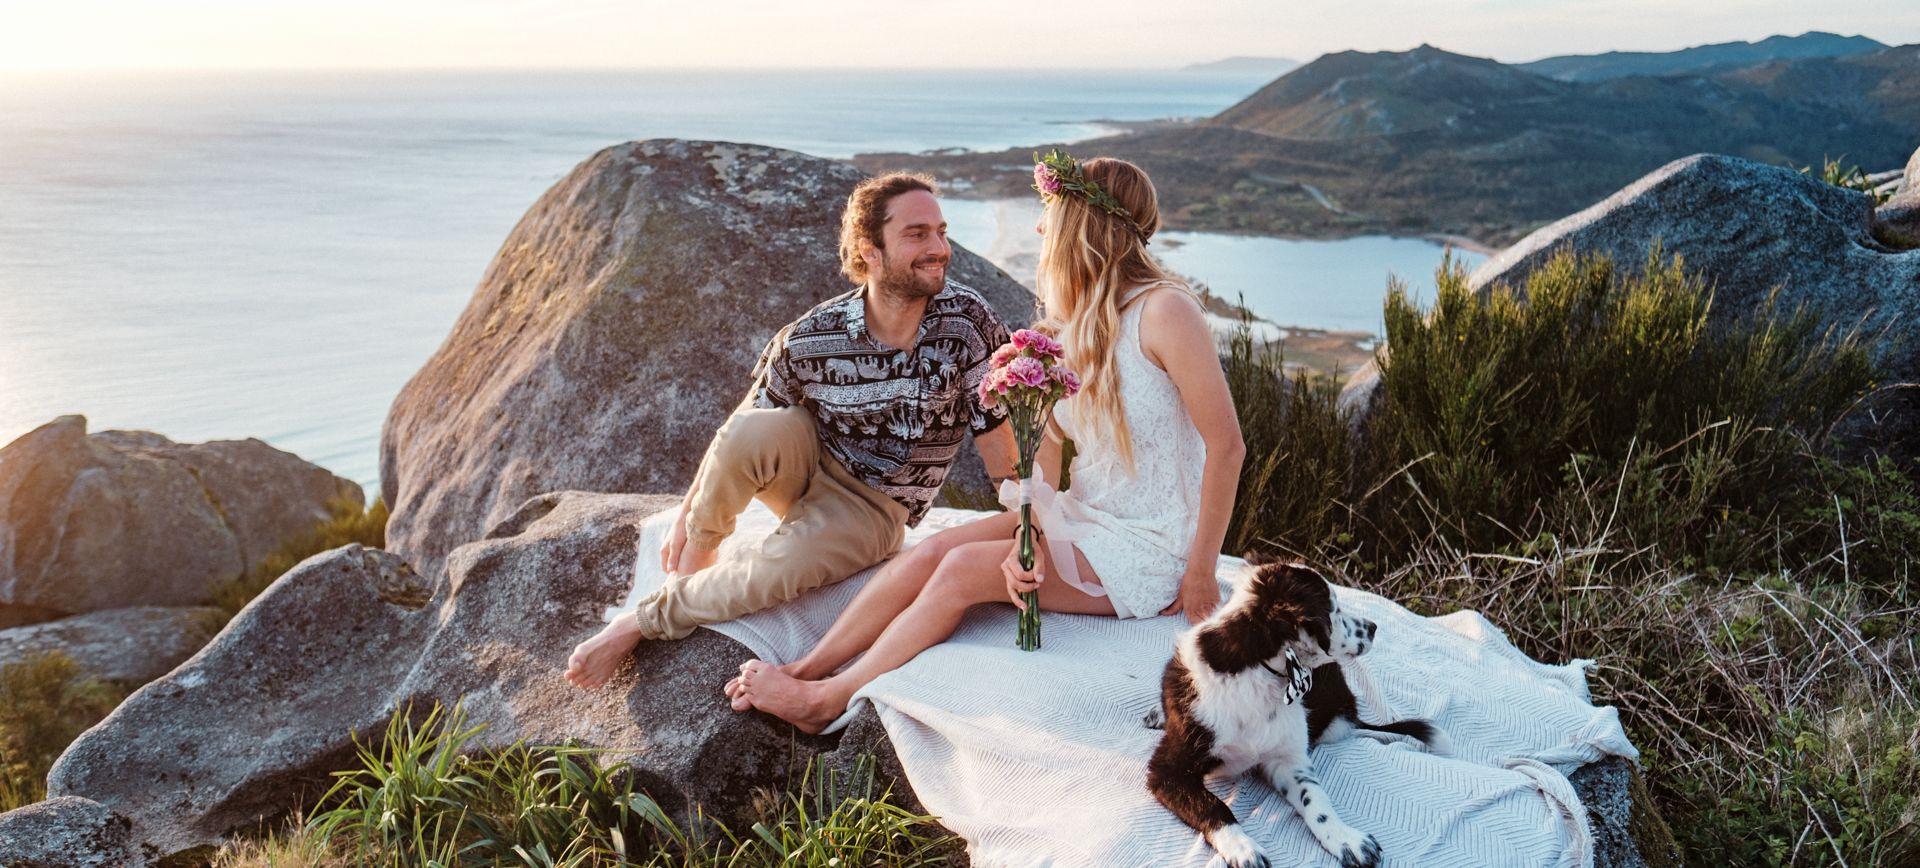 Beach Wedding Package Spain - 3 days of Adventure